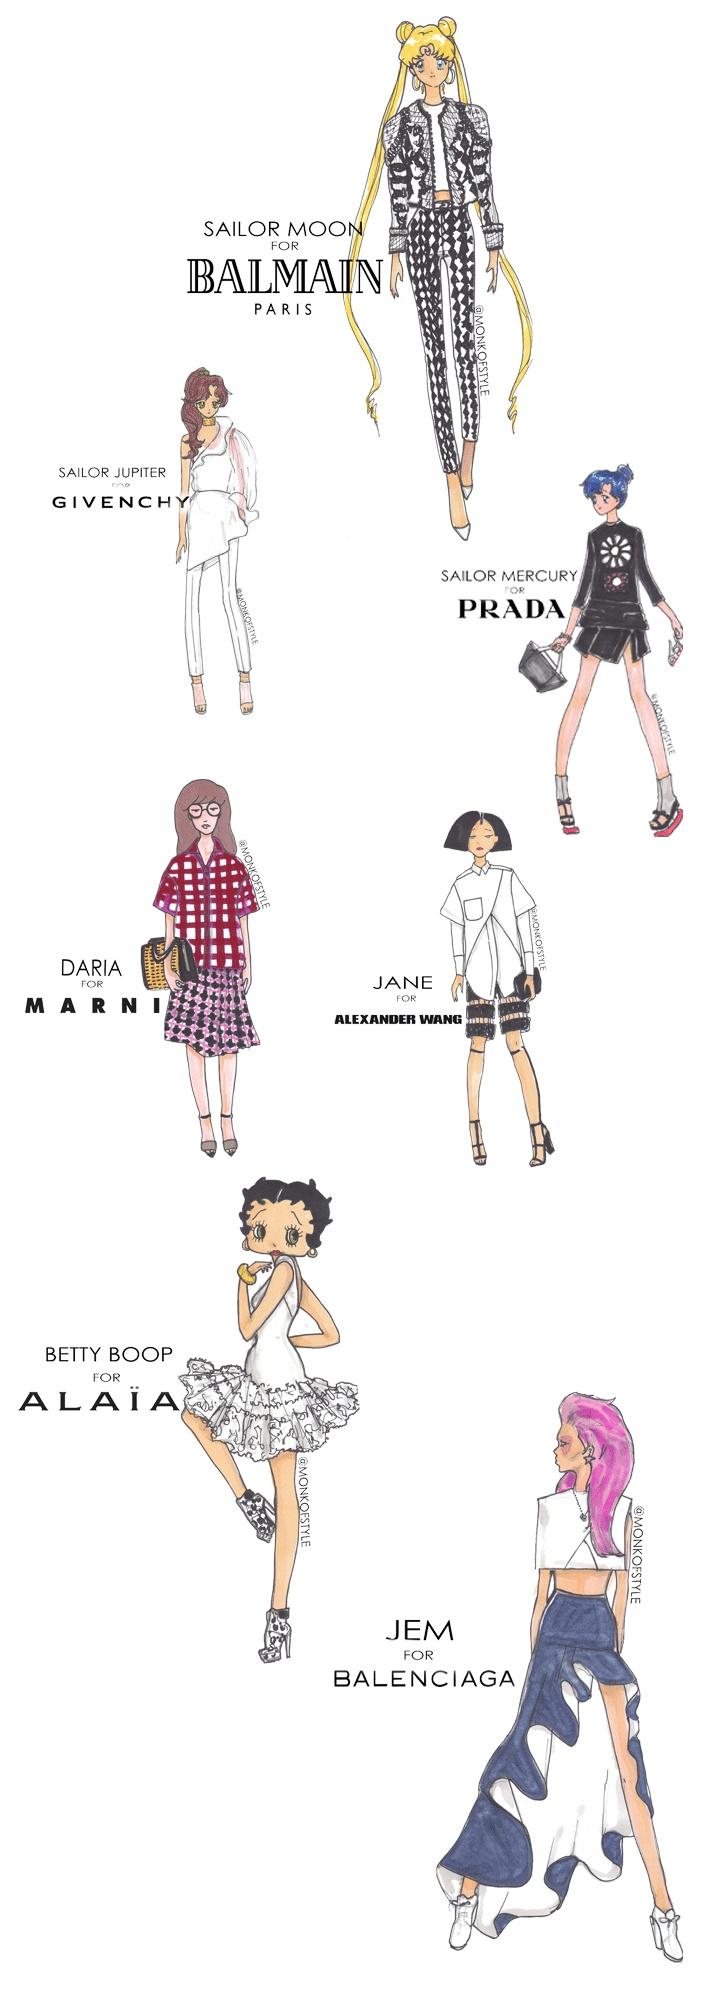 fashion-hereos  http://blog.maboutiquecherie.se/2013/01/21/fashion-hereos/